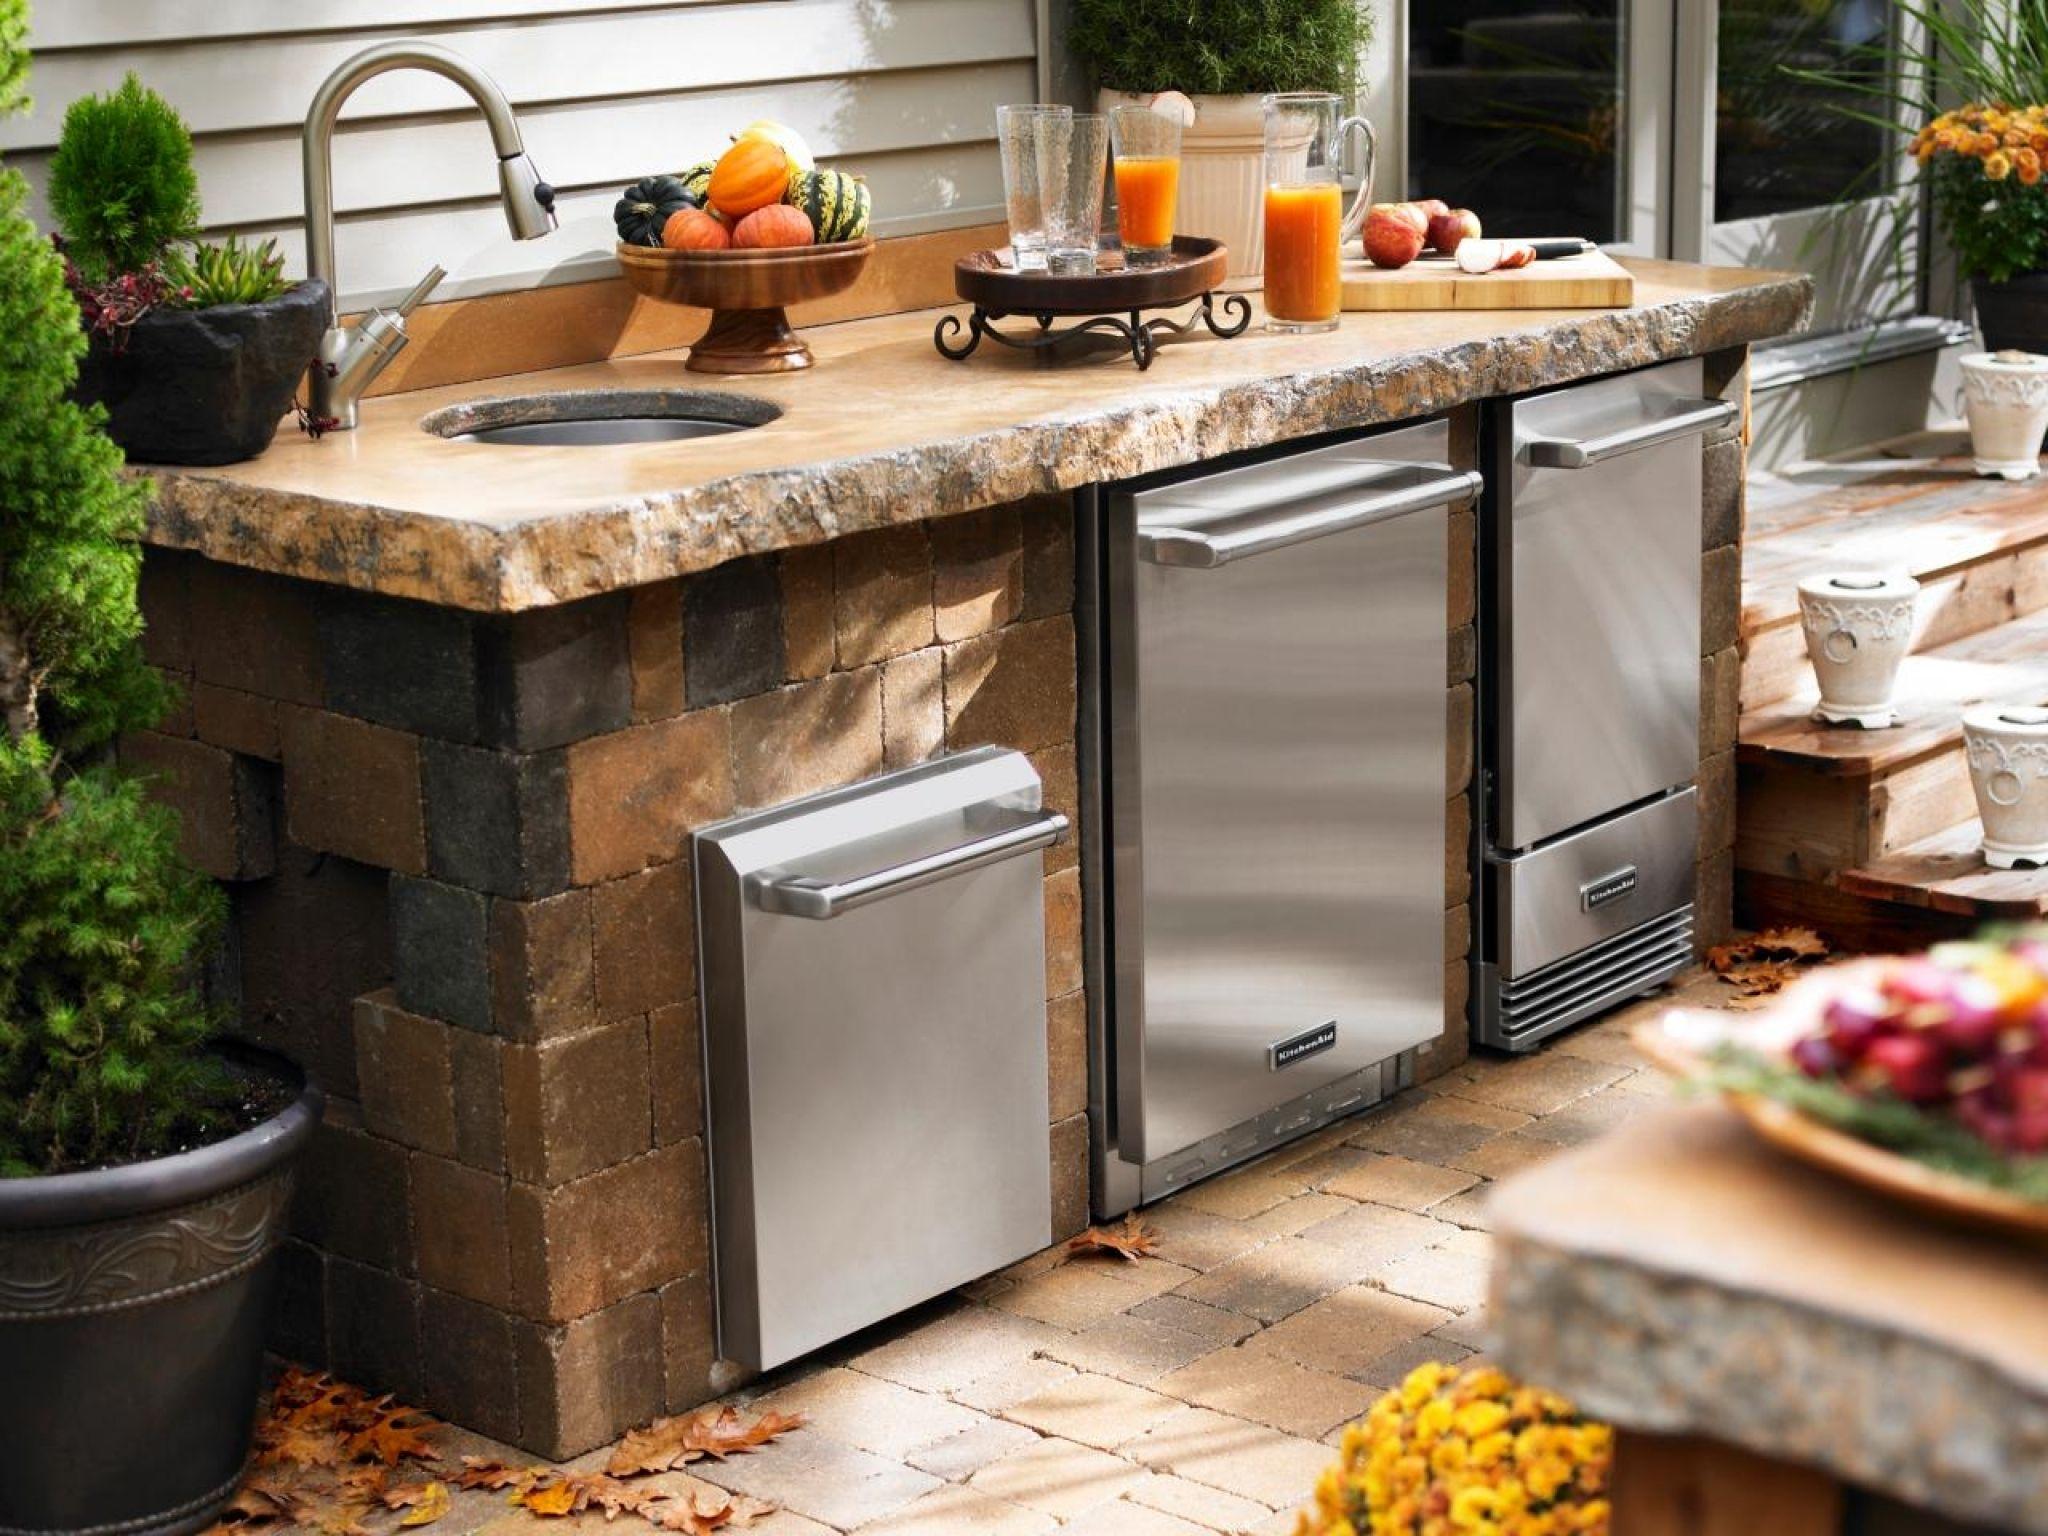 Outdoor kitchen design ideas interior paint color schemes check